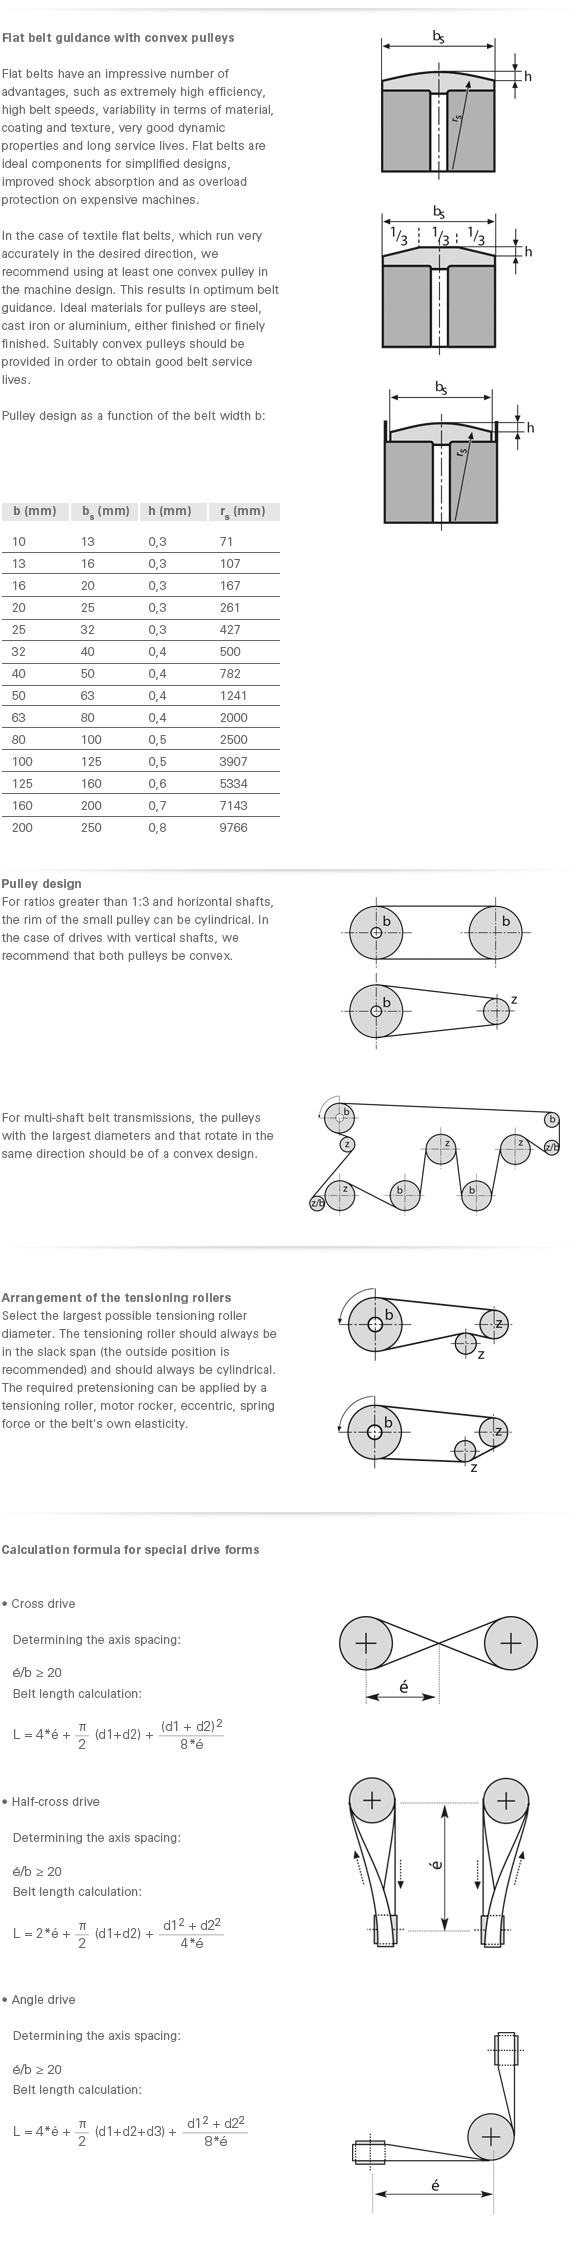 Technical data for designers